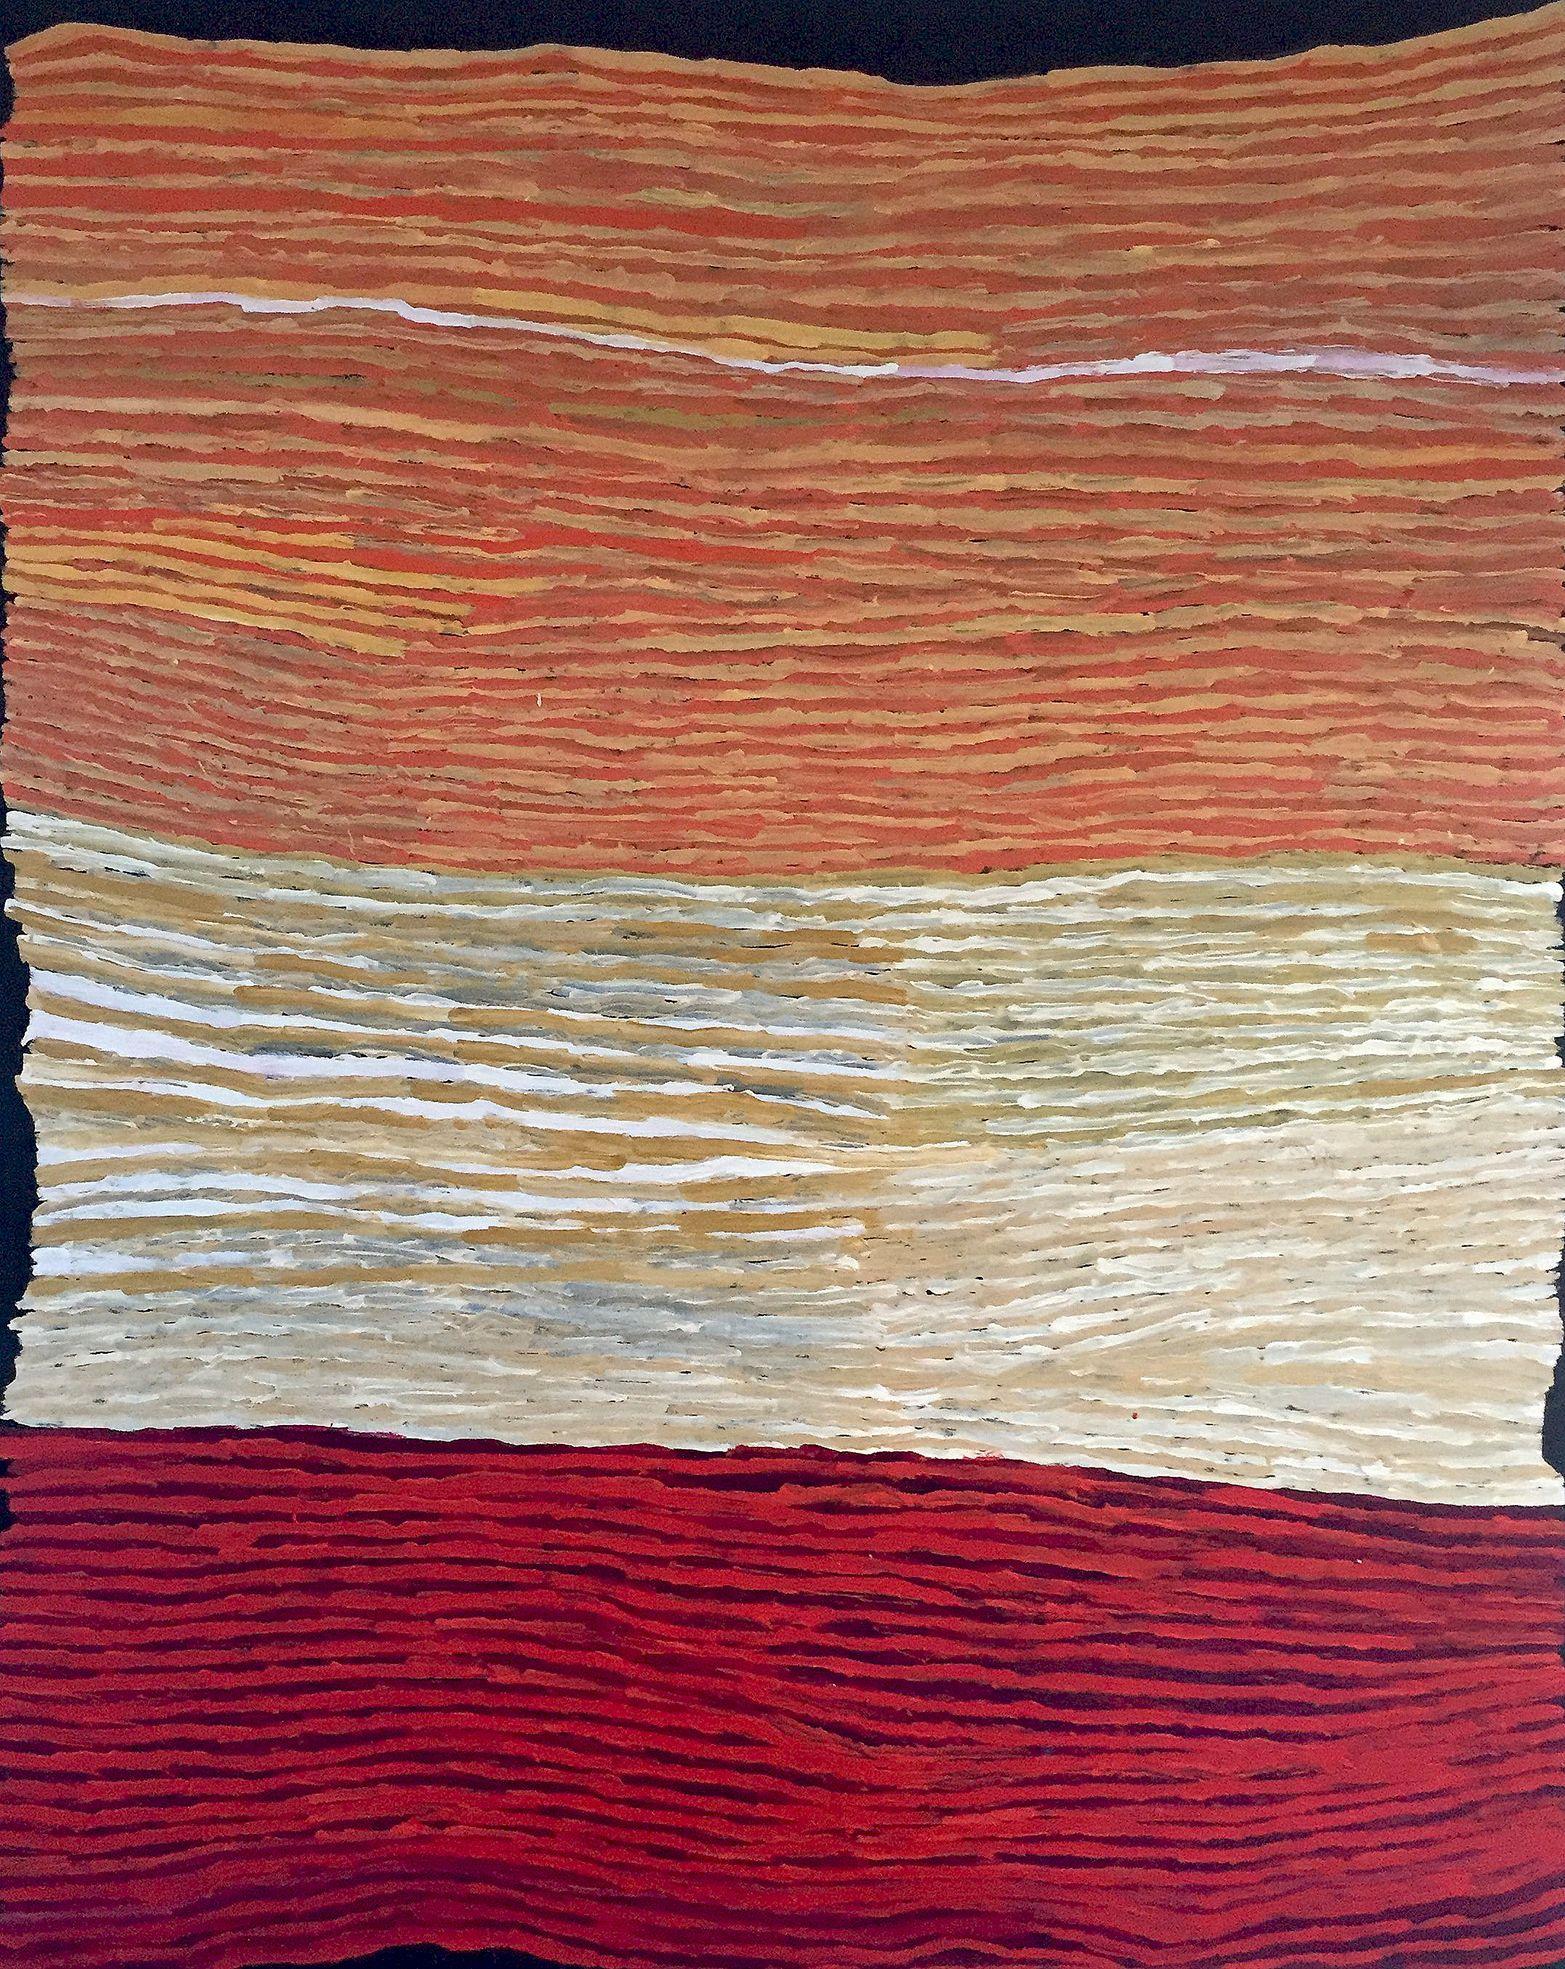 Ray Ken - Tali - Sand dune - 152x122 cm - 450-15 http://www.aboriginalsignature.com/art-aborigene-tjala/ray-ken-tali-sand-dune-152x122-cm-450-15